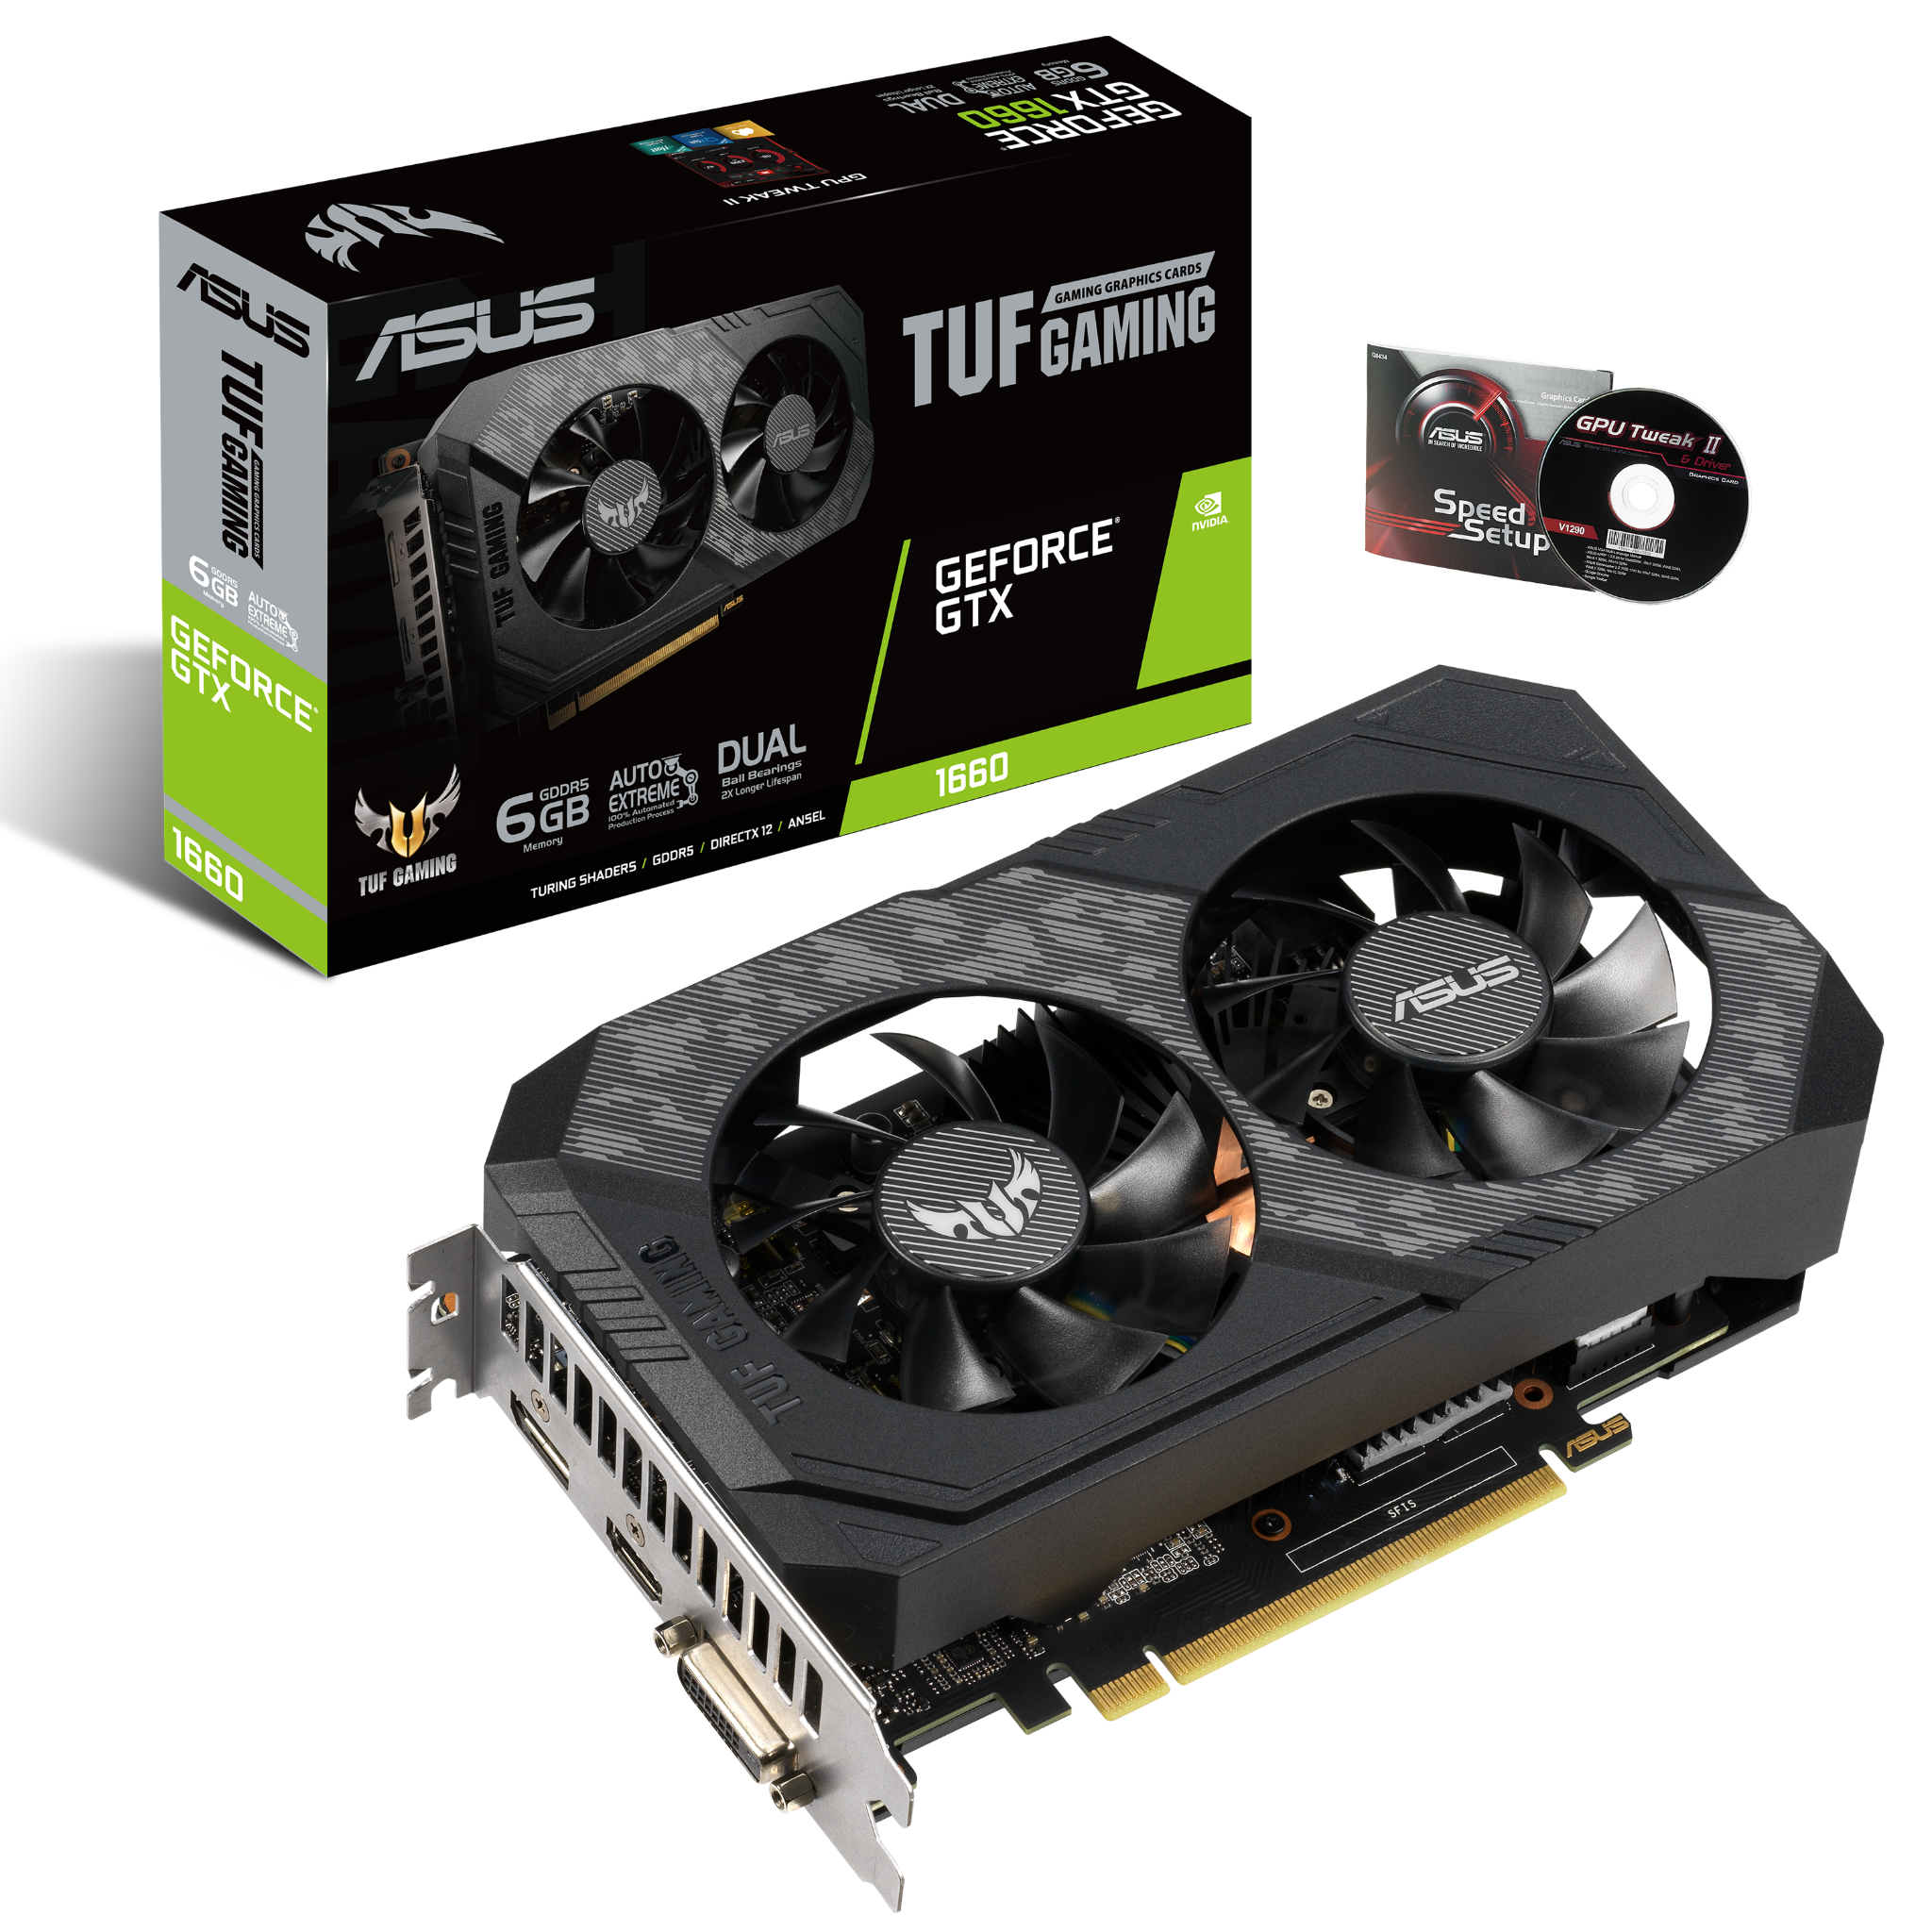 ASUS TUF GTX 1660 6G Gaming GDDR5